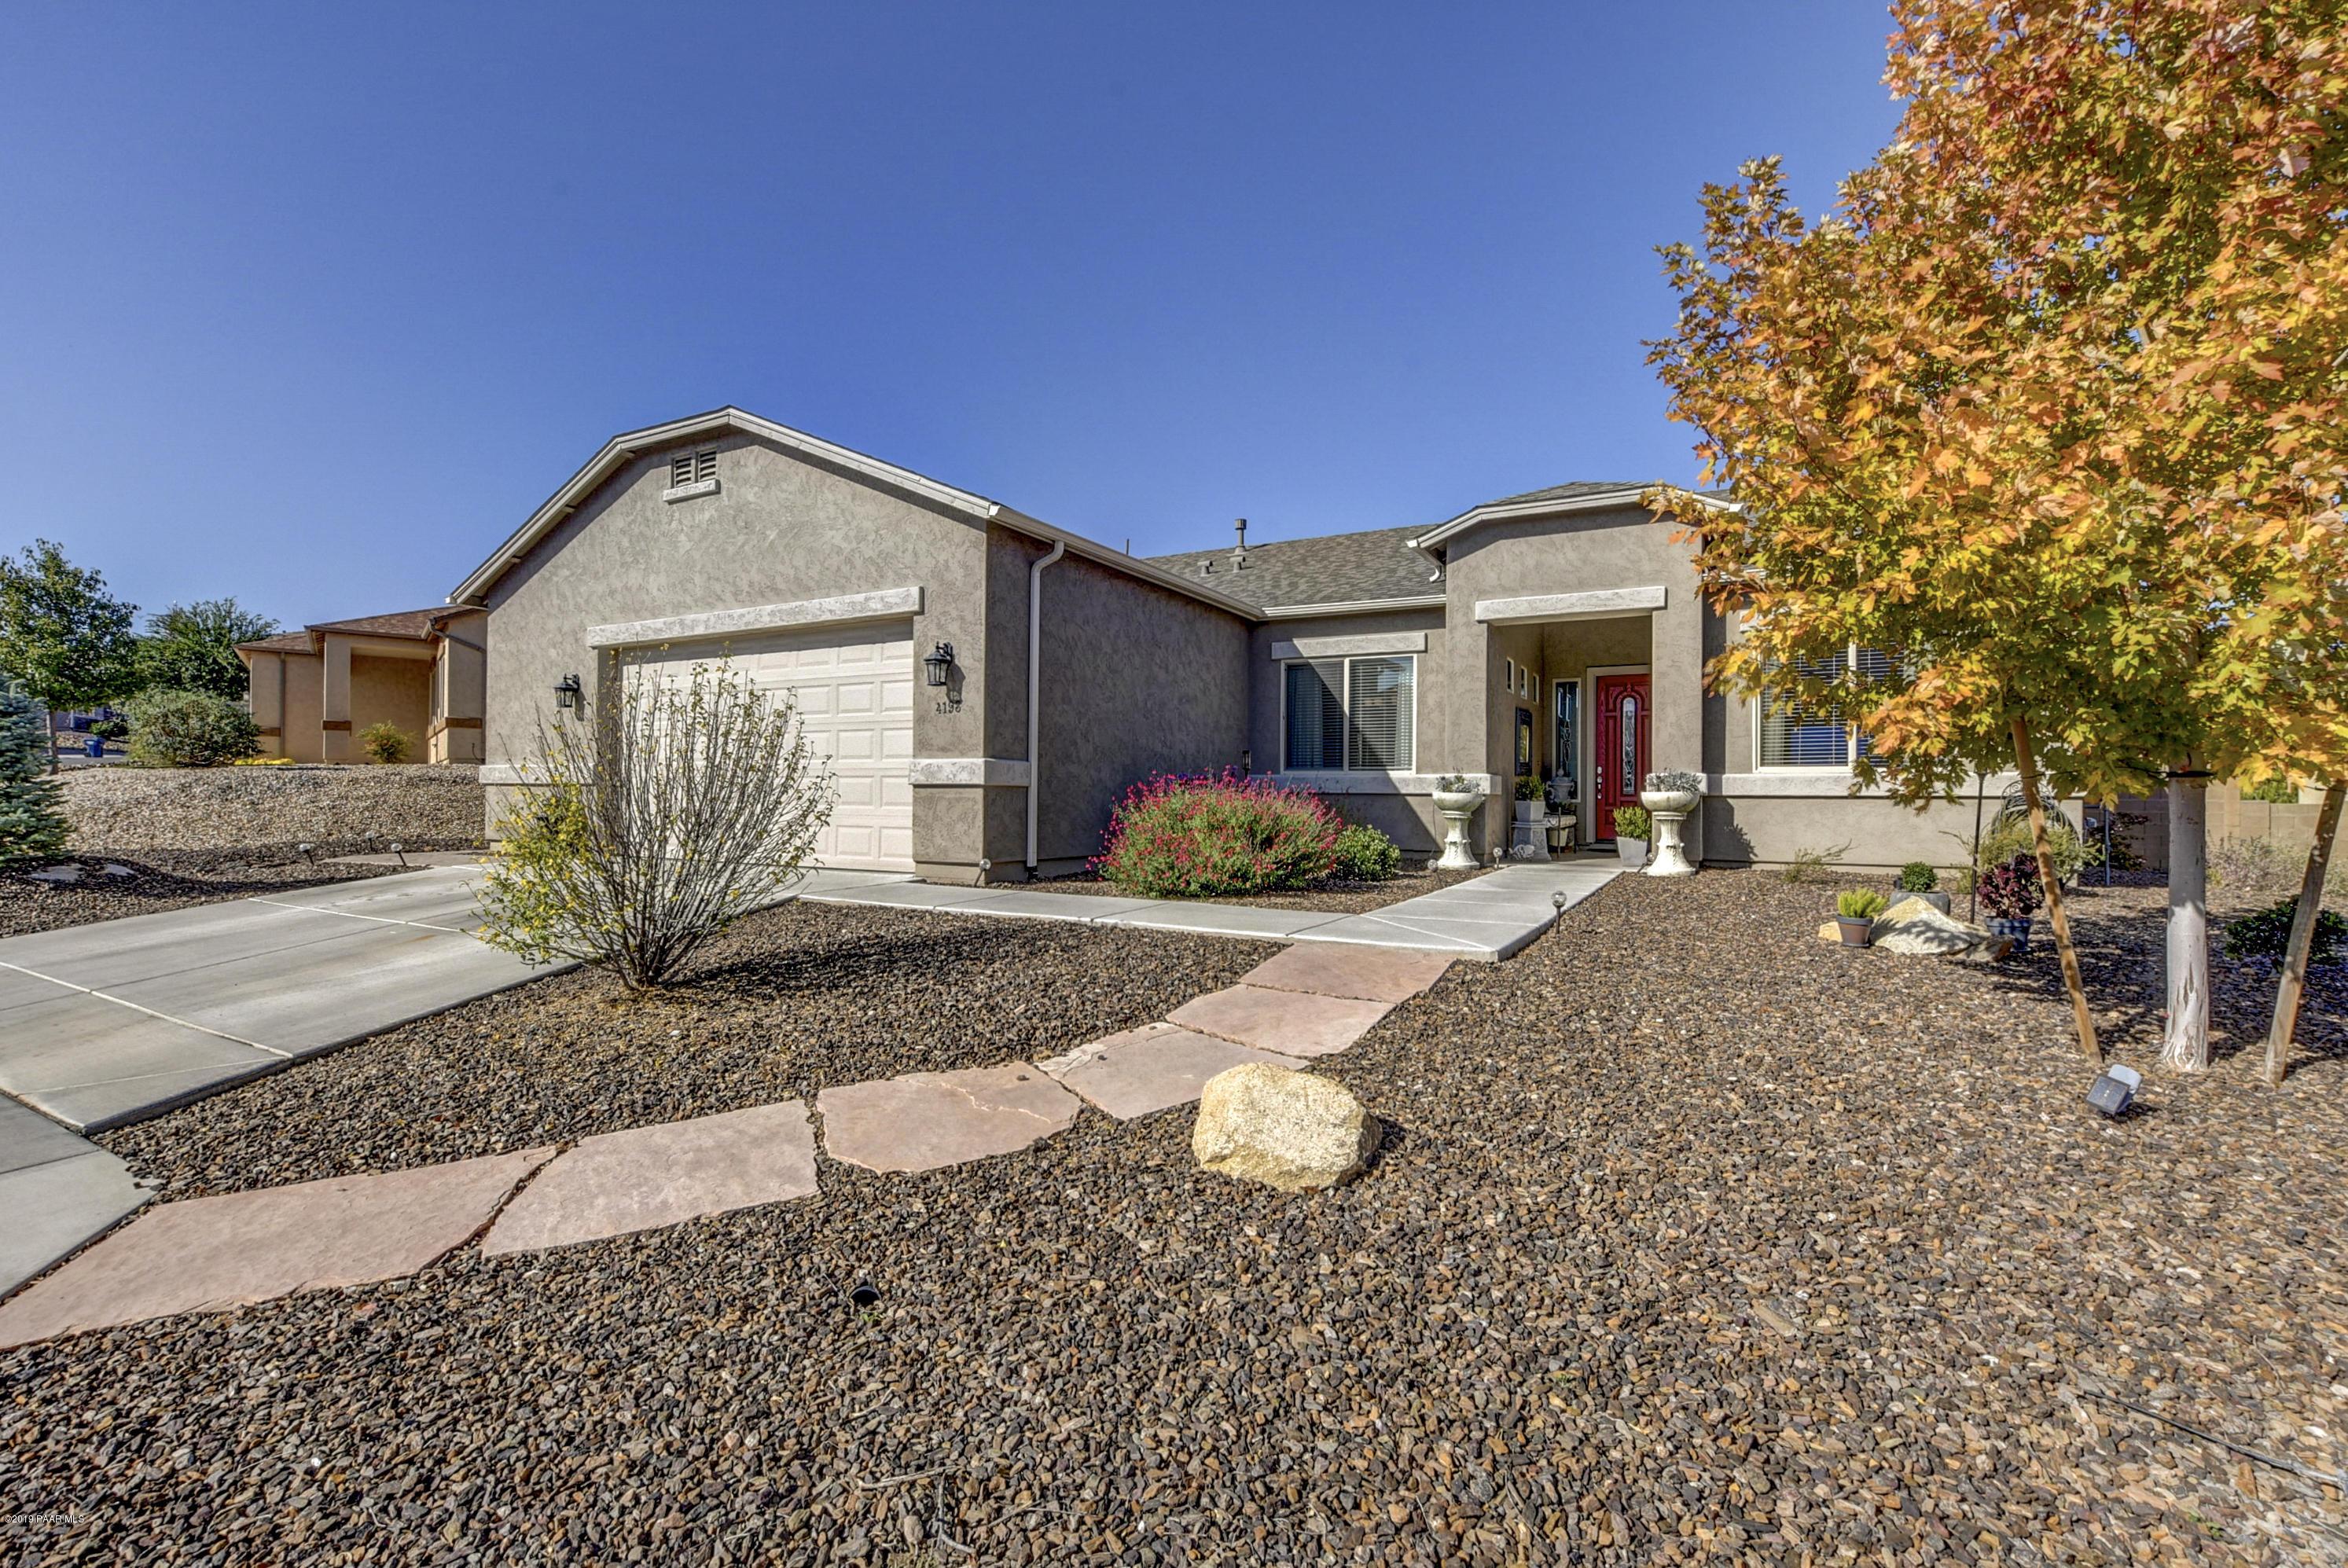 Photo of 4198 Pembroke, Prescott Valley, AZ 86314